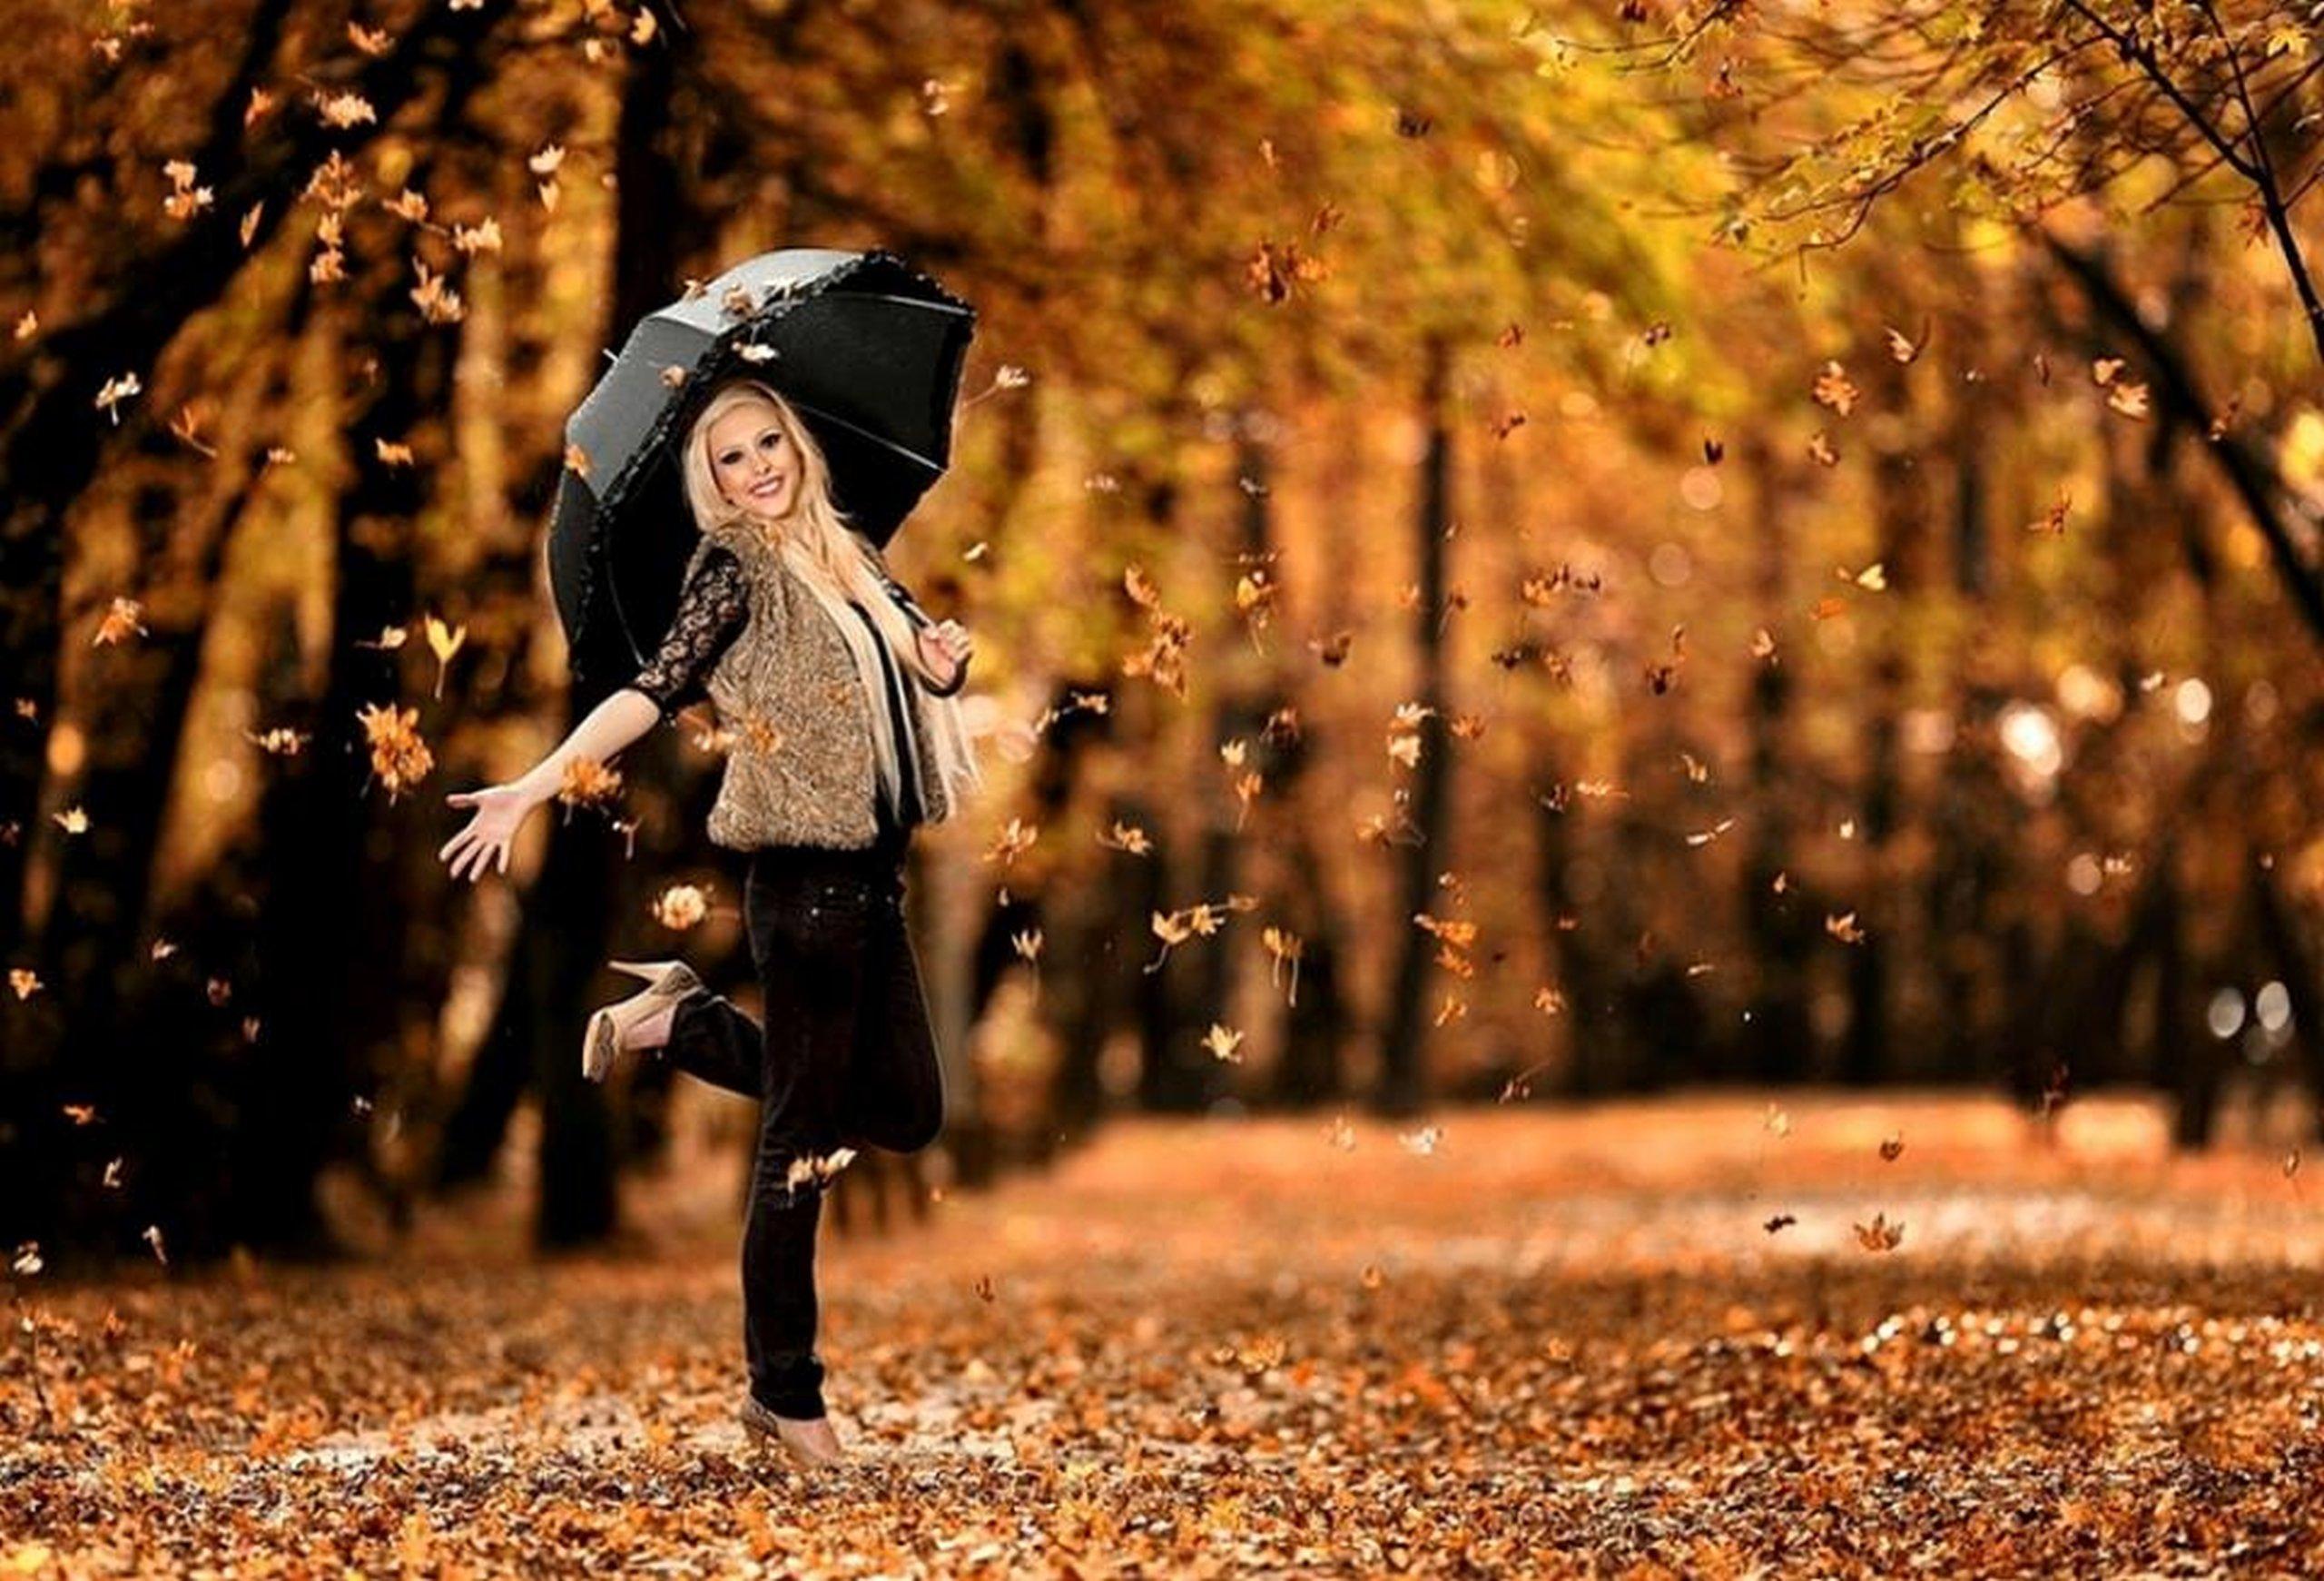 Fall Leaves Dancing Wallpaper Leaves Hair Orange Lady Beauty Girl Park Autumn Wallpaper